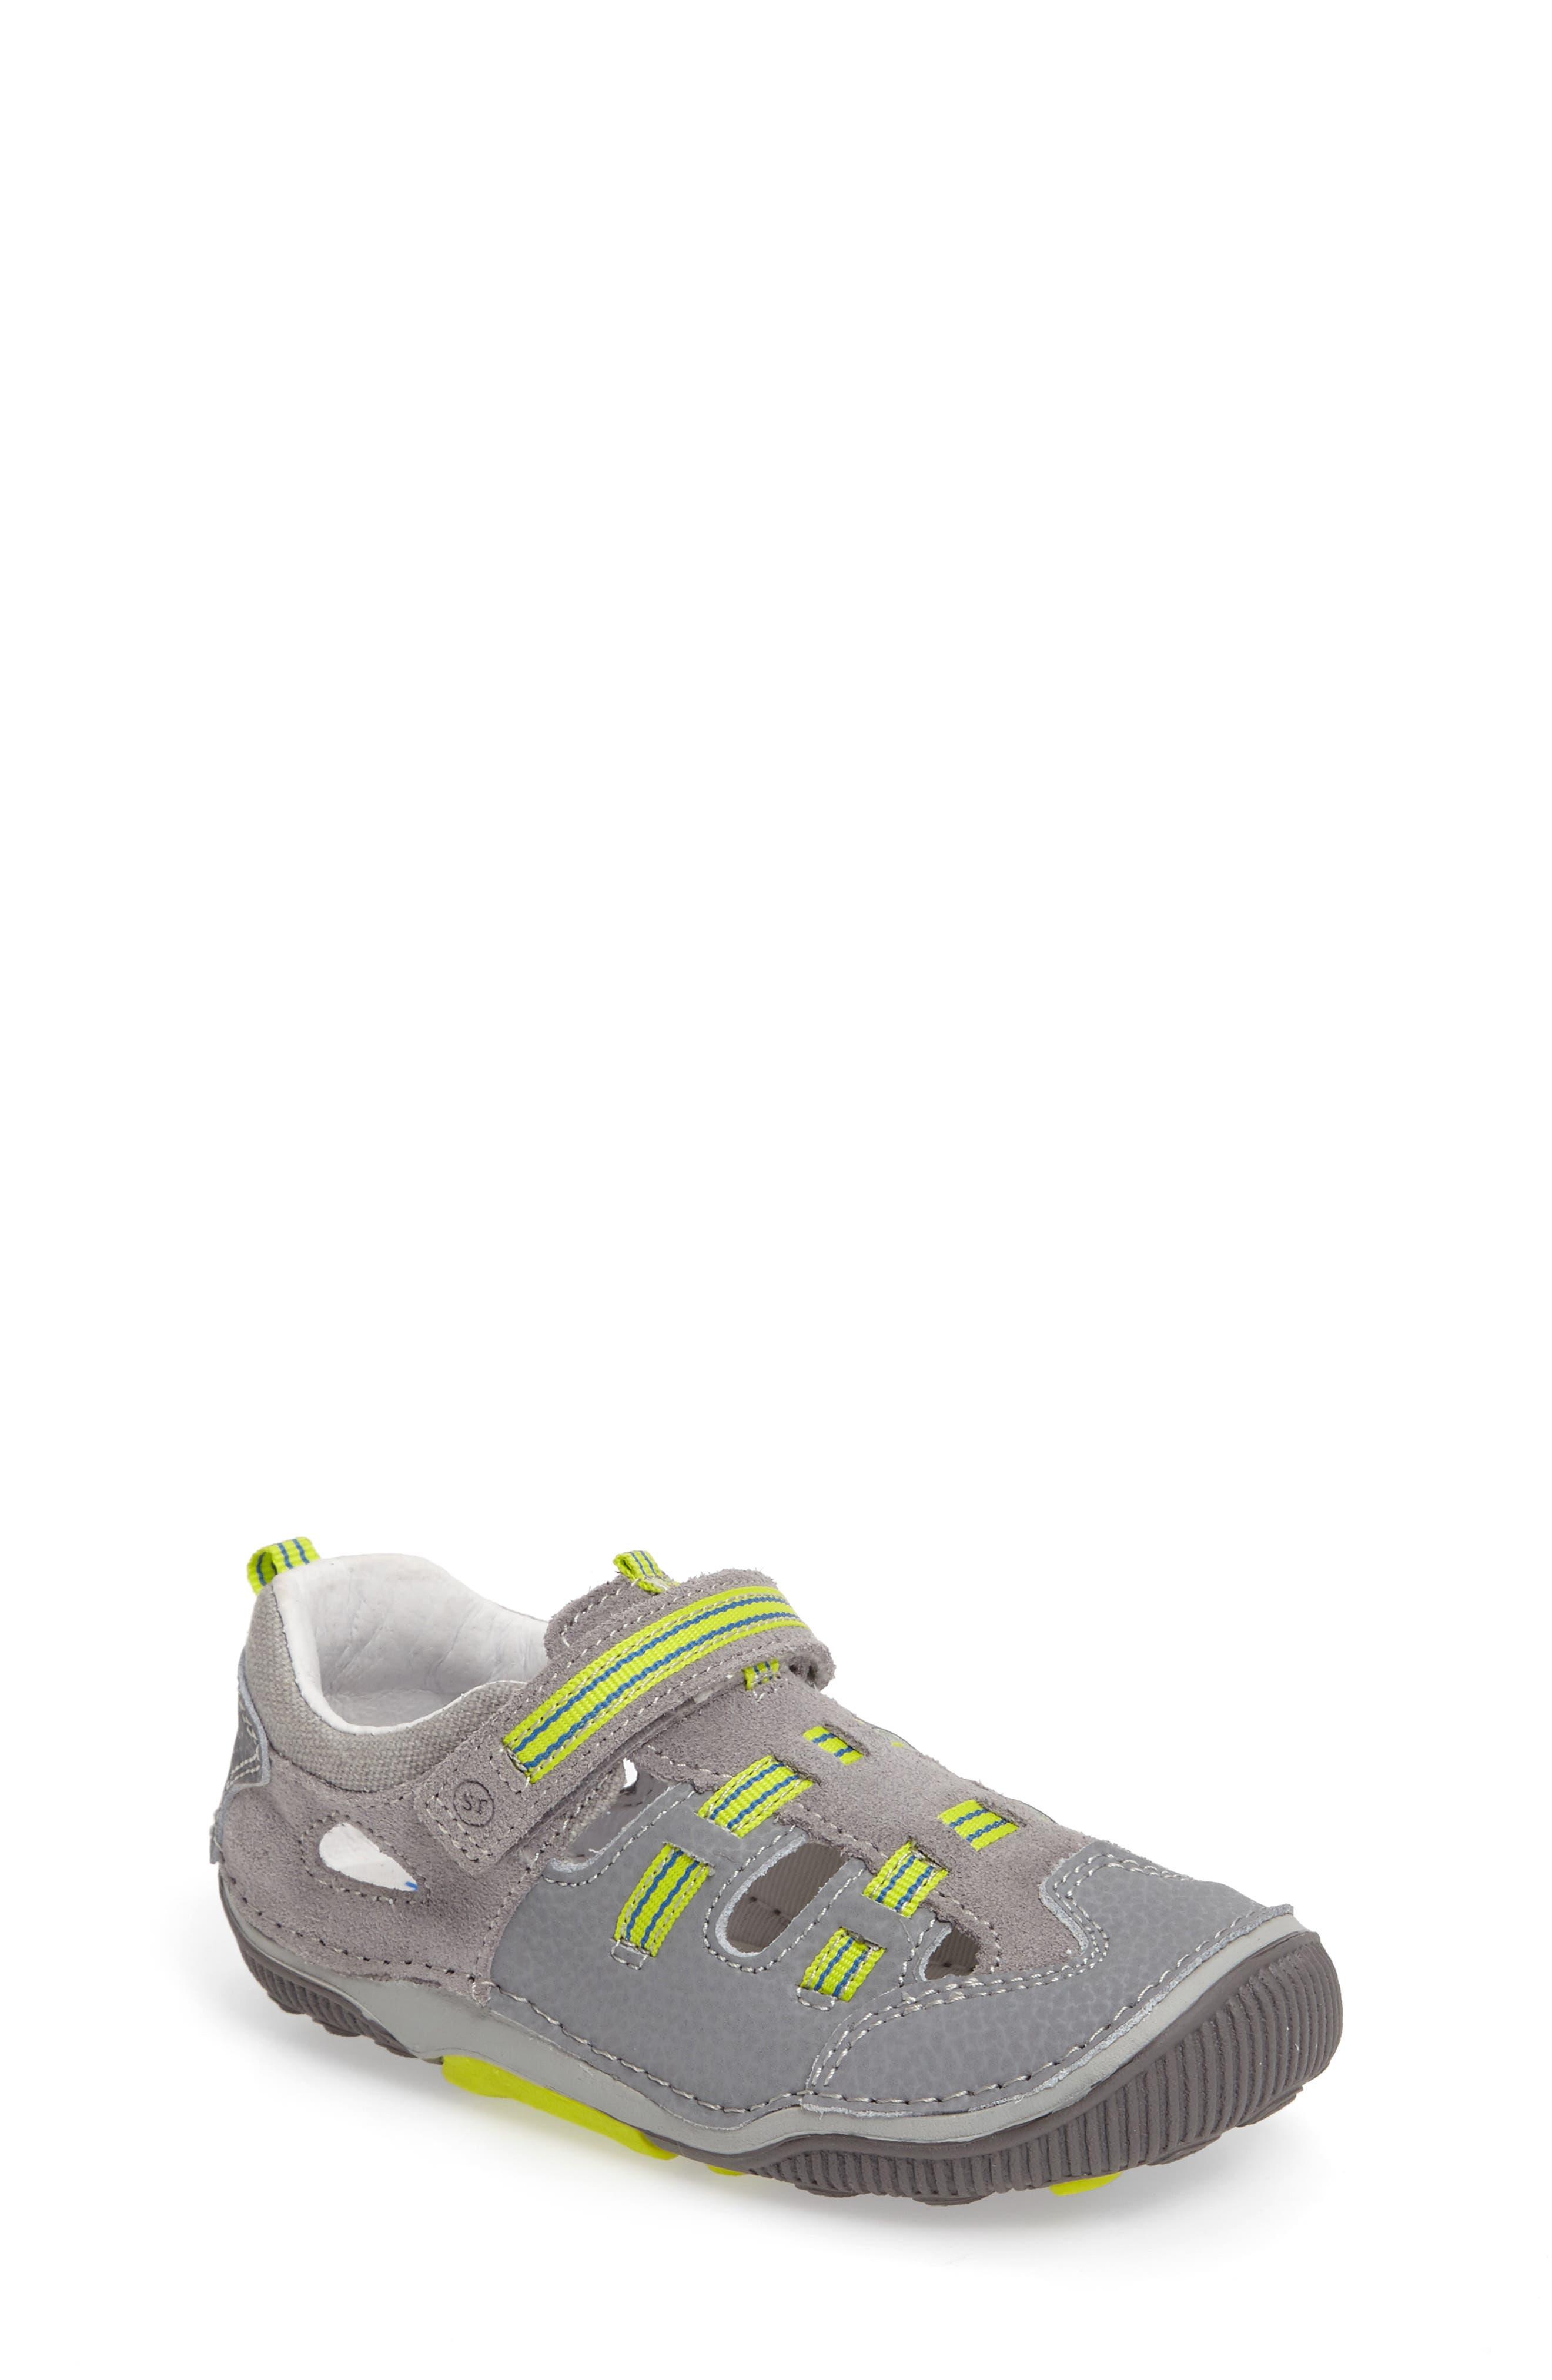 Reggie Cutout Sneaker,                             Main thumbnail 1, color,                             020